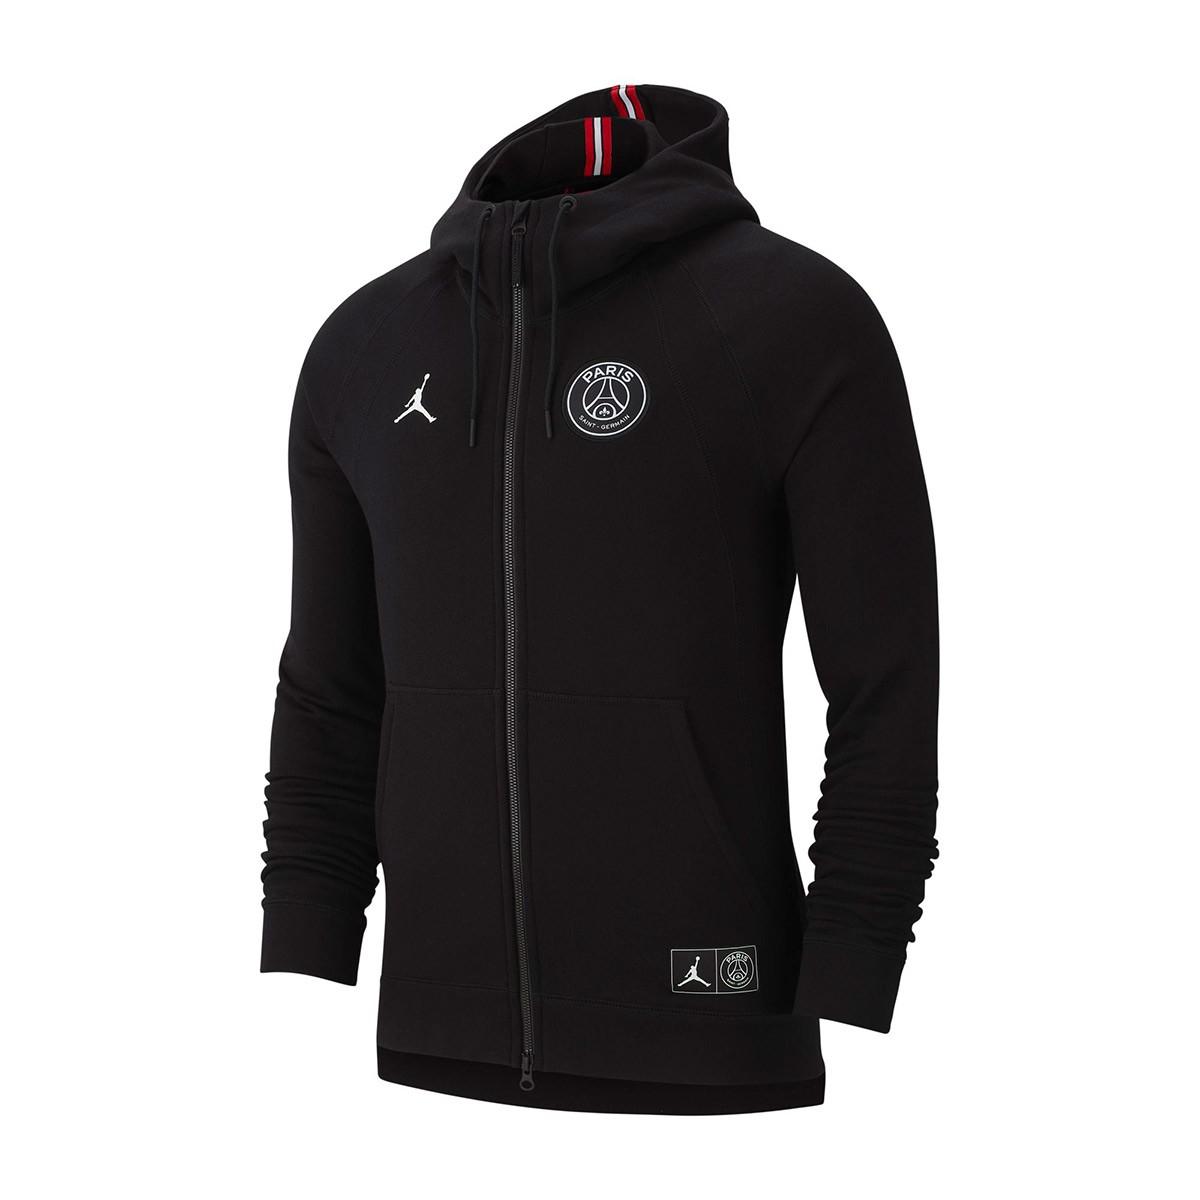 5a2780bceb6 Sweatshirt Nike Jordan x PSG Wings FZ Black-White - Football store ...